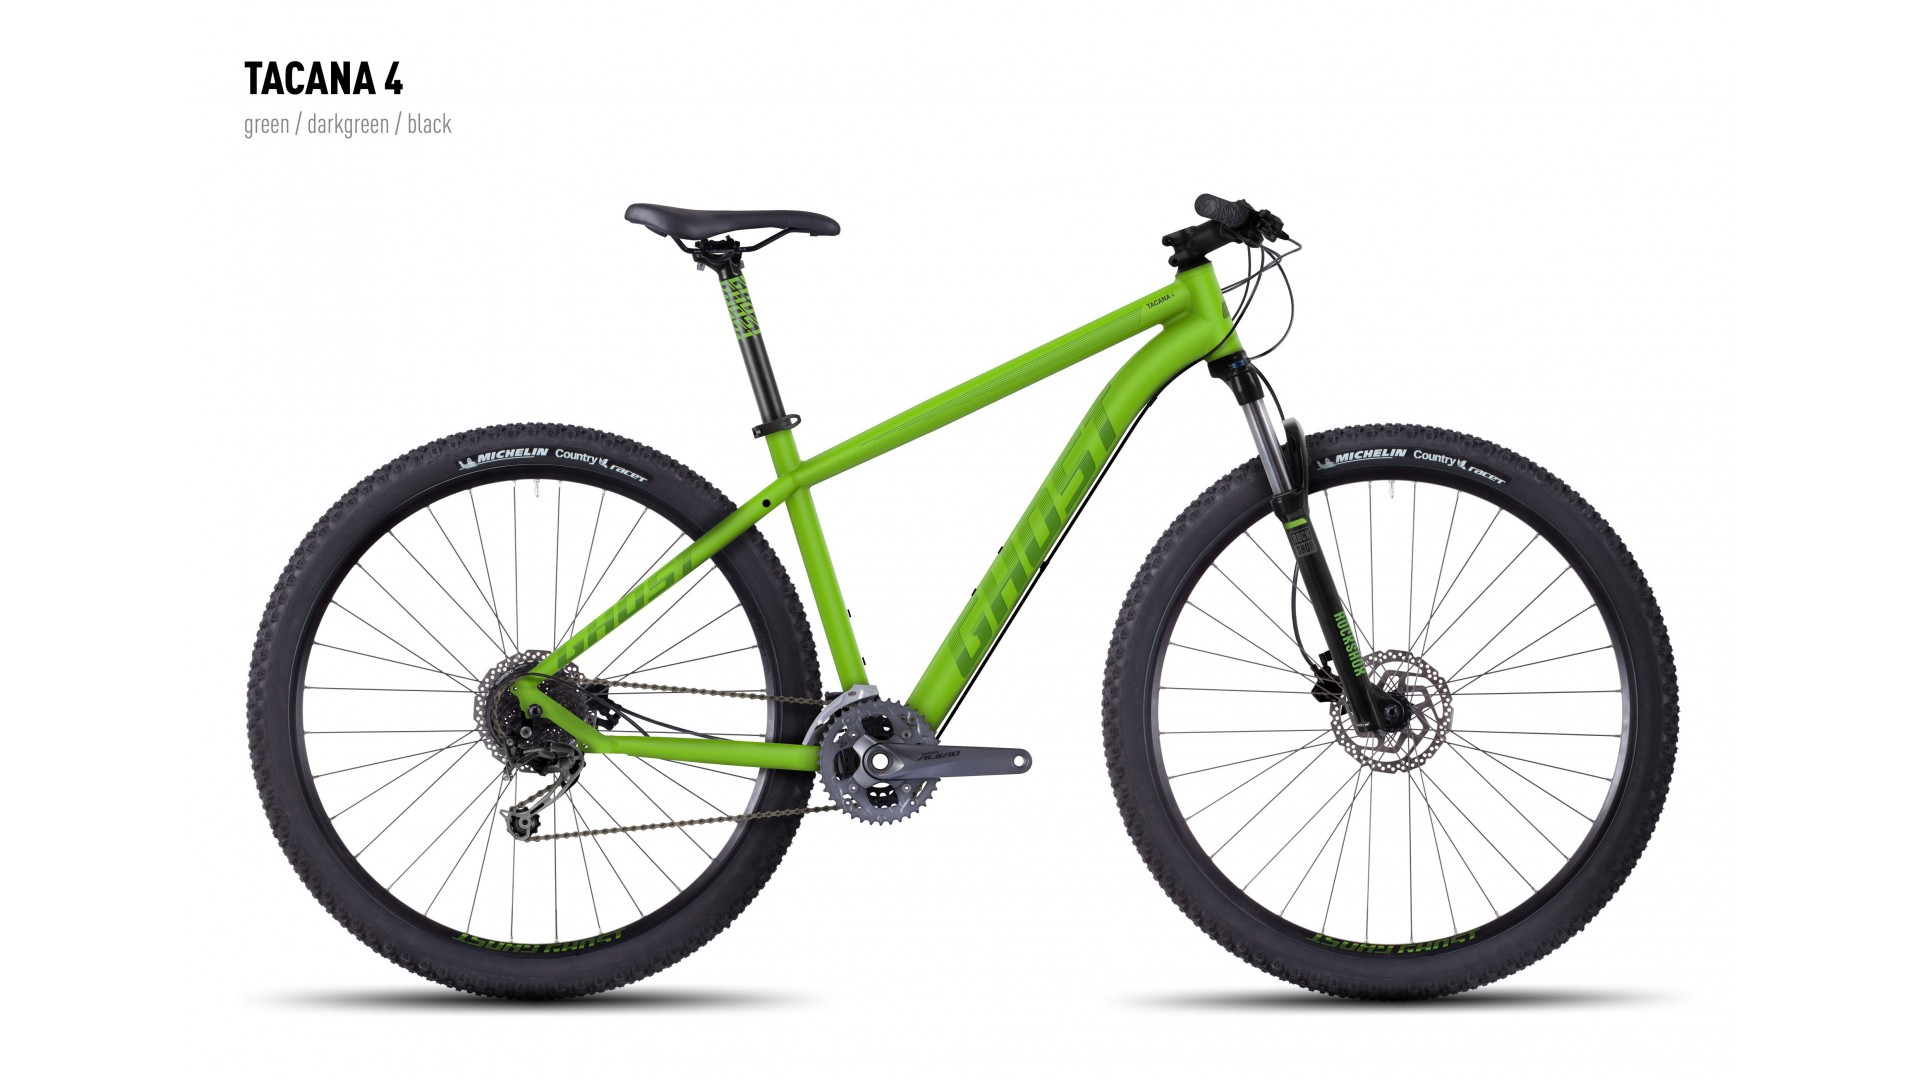 Велосипед GHOST Tacana 4 green/darkgreen/black год 2016